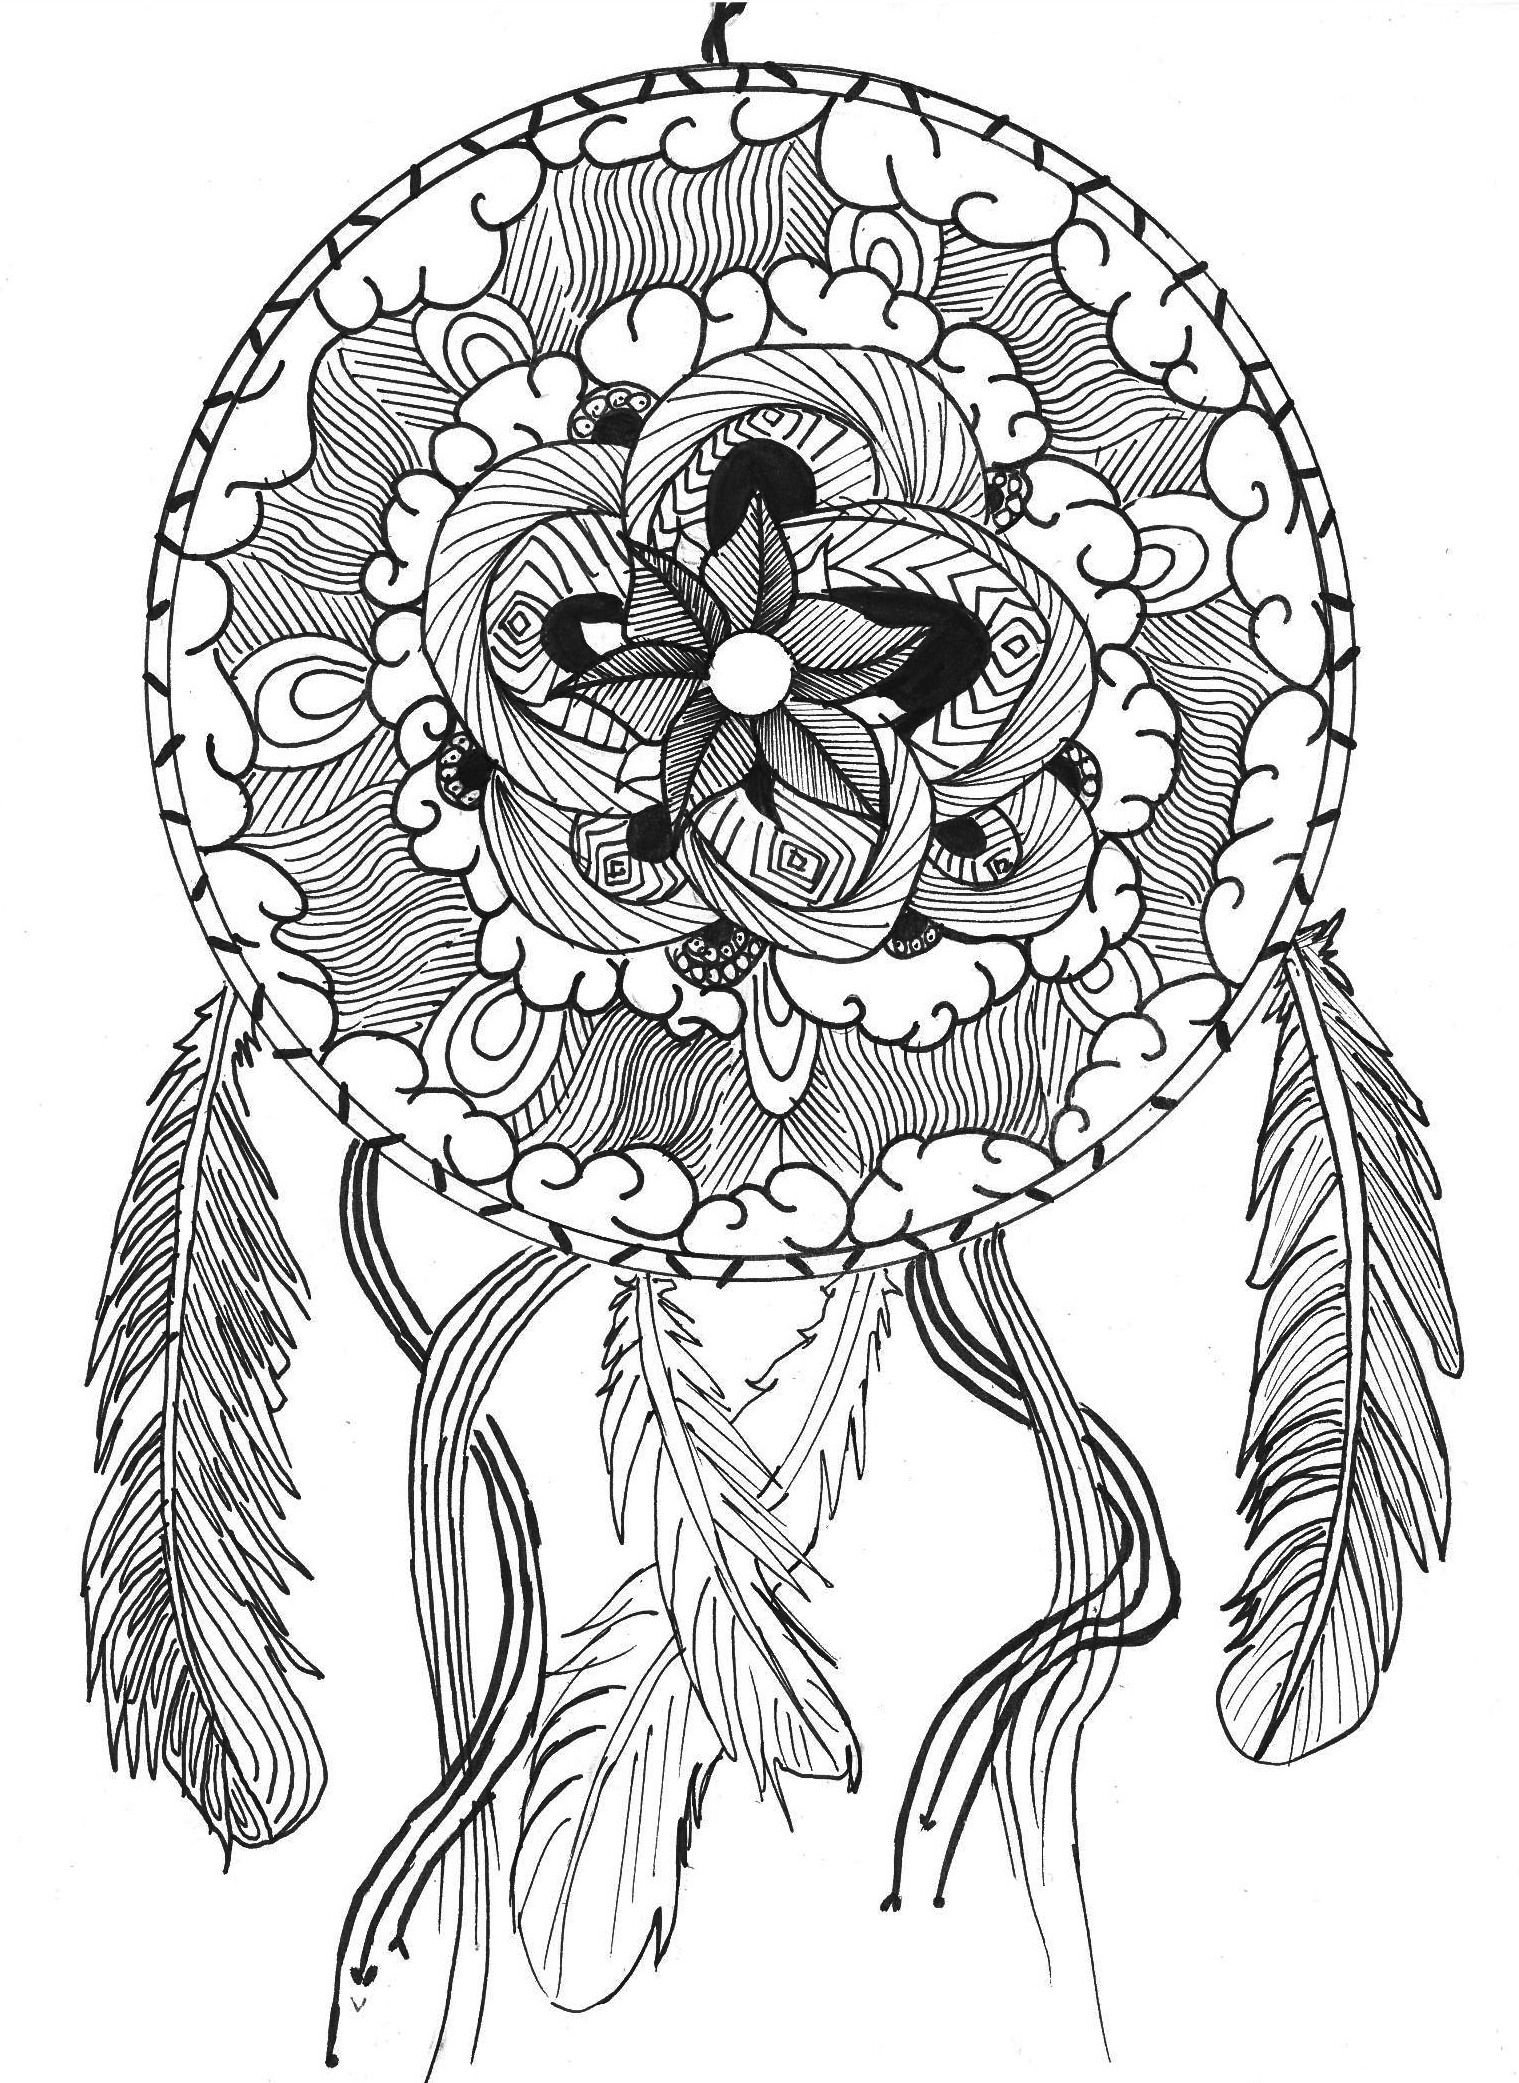 Pin von ColoringsWorld.com auf Mandala Coloring Pages | Pinterest